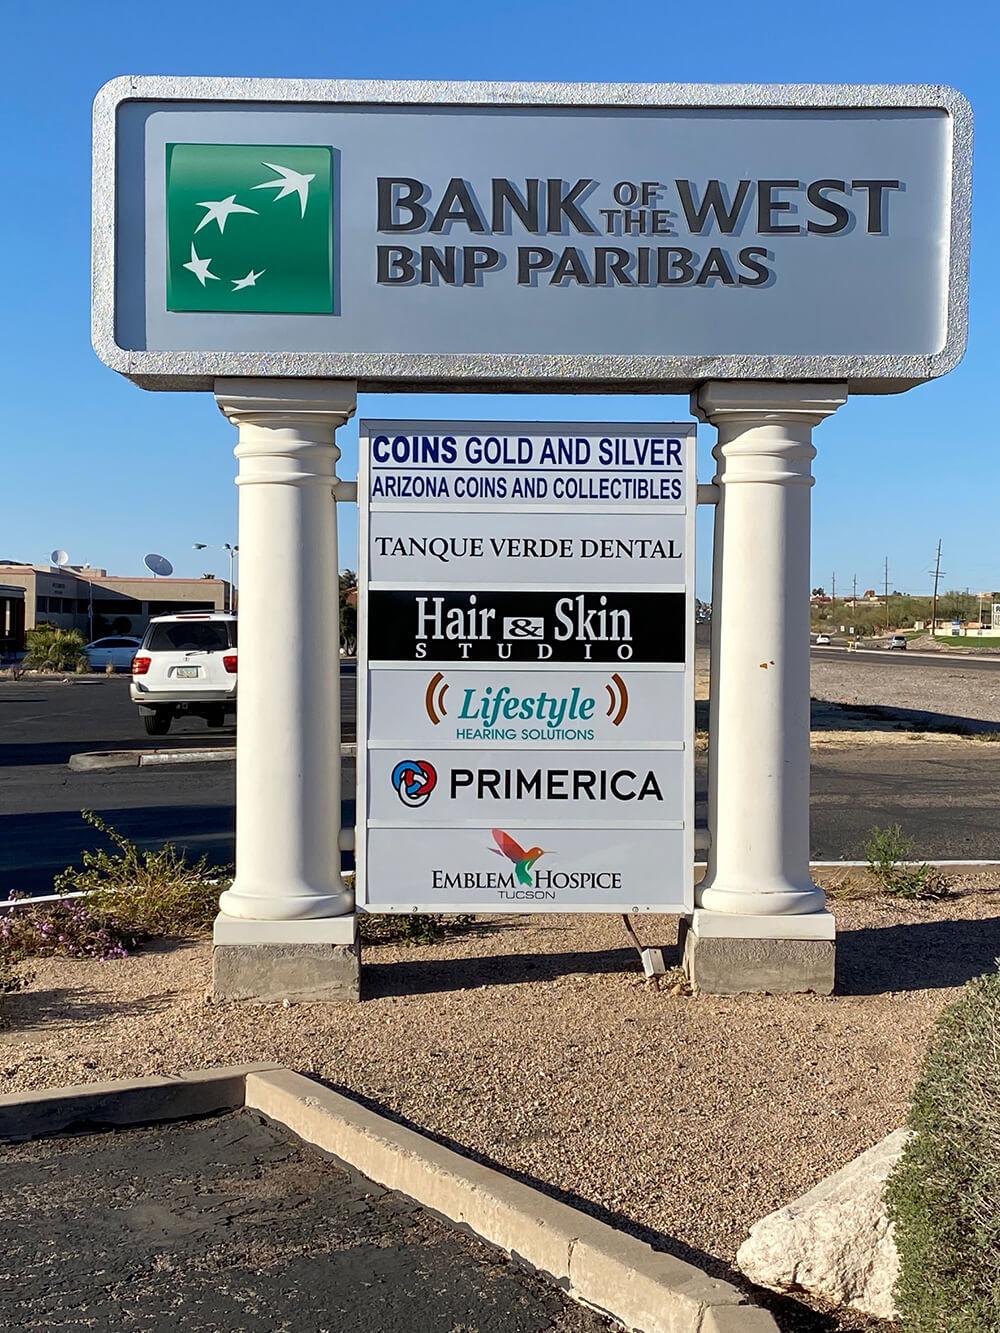 Bank Of The West BNP Paribas